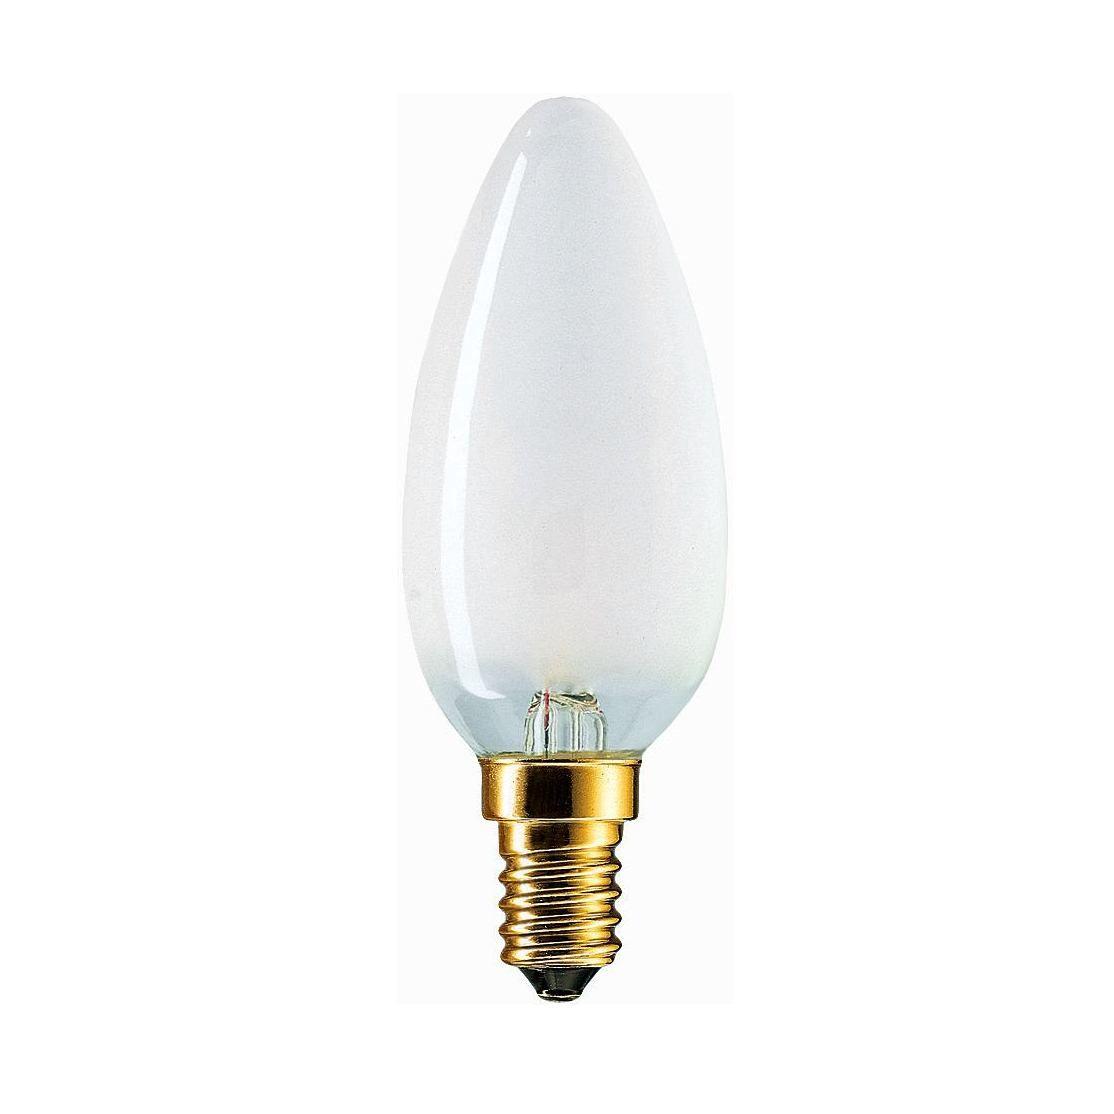 Купить Лампа накаливания Philips Stan 25W E14 230V B35 FR 1CT/10X10F свеча, матовая